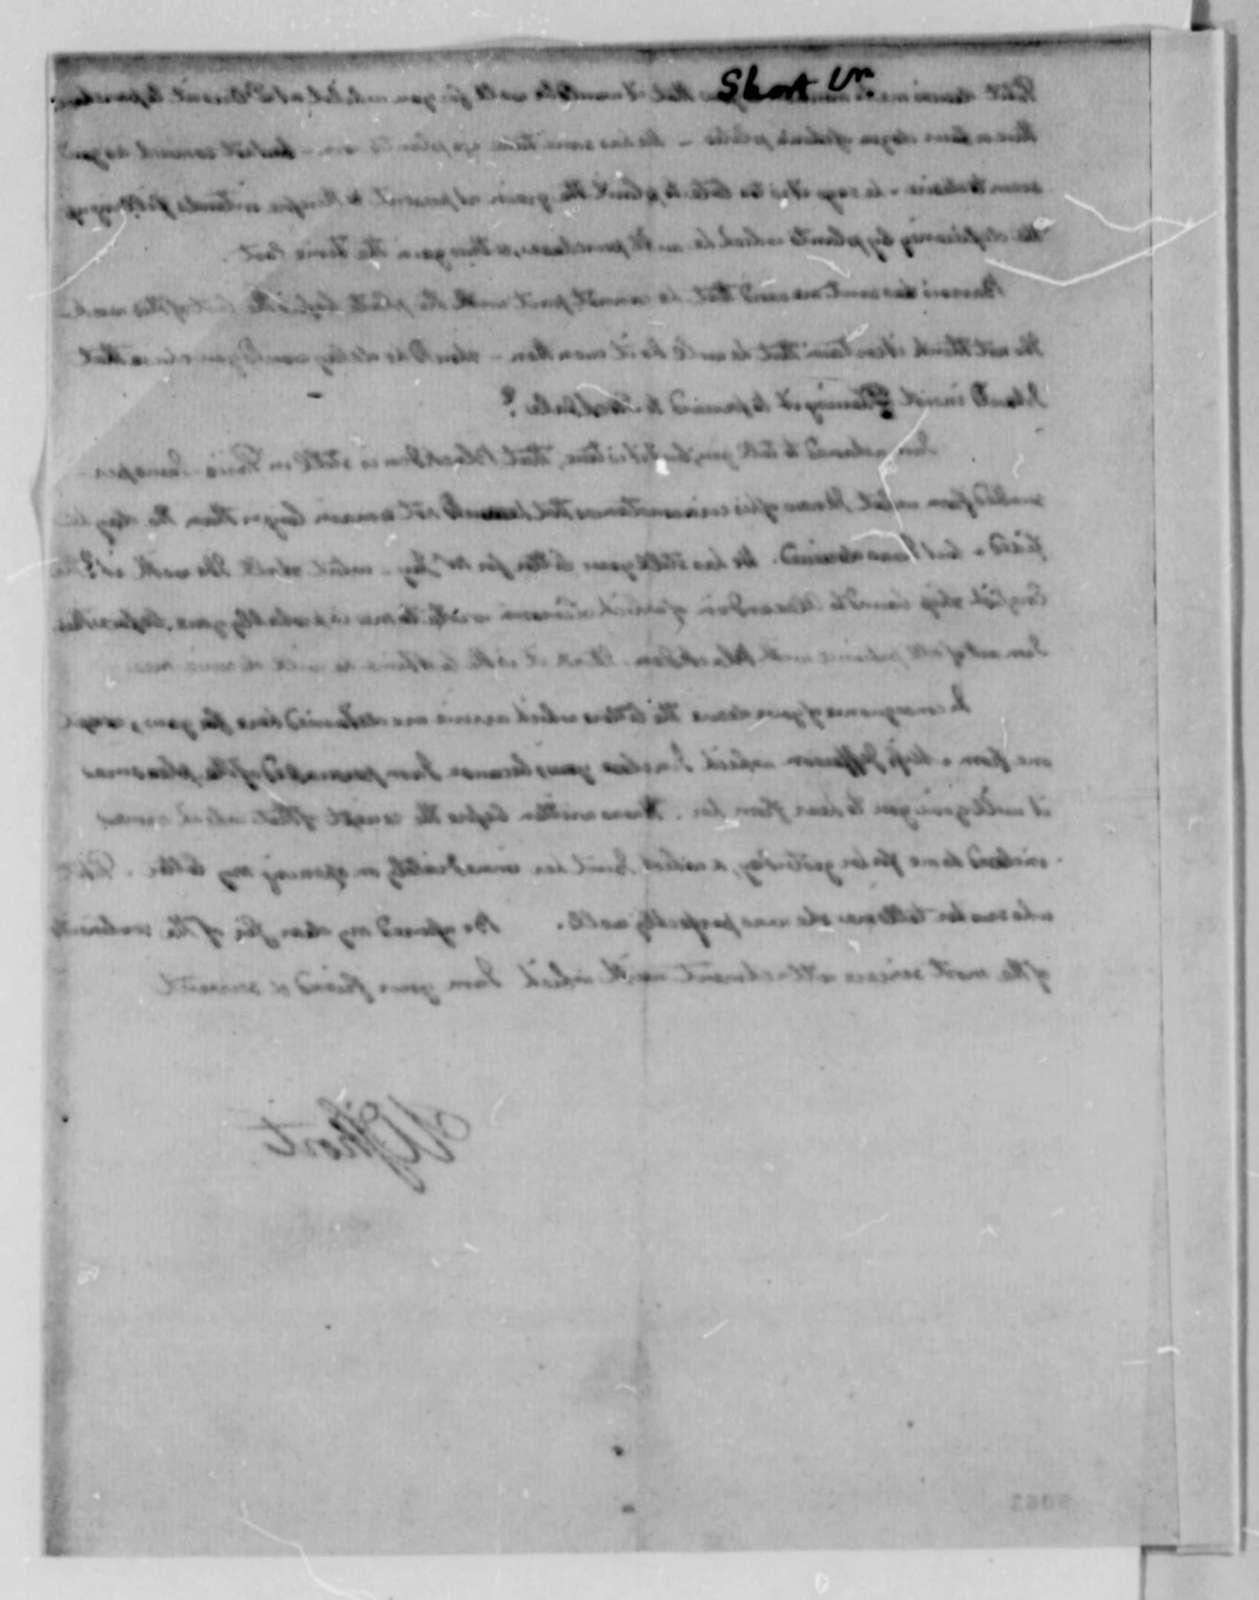 William Short to Thomas Jefferson, May 29, 1787